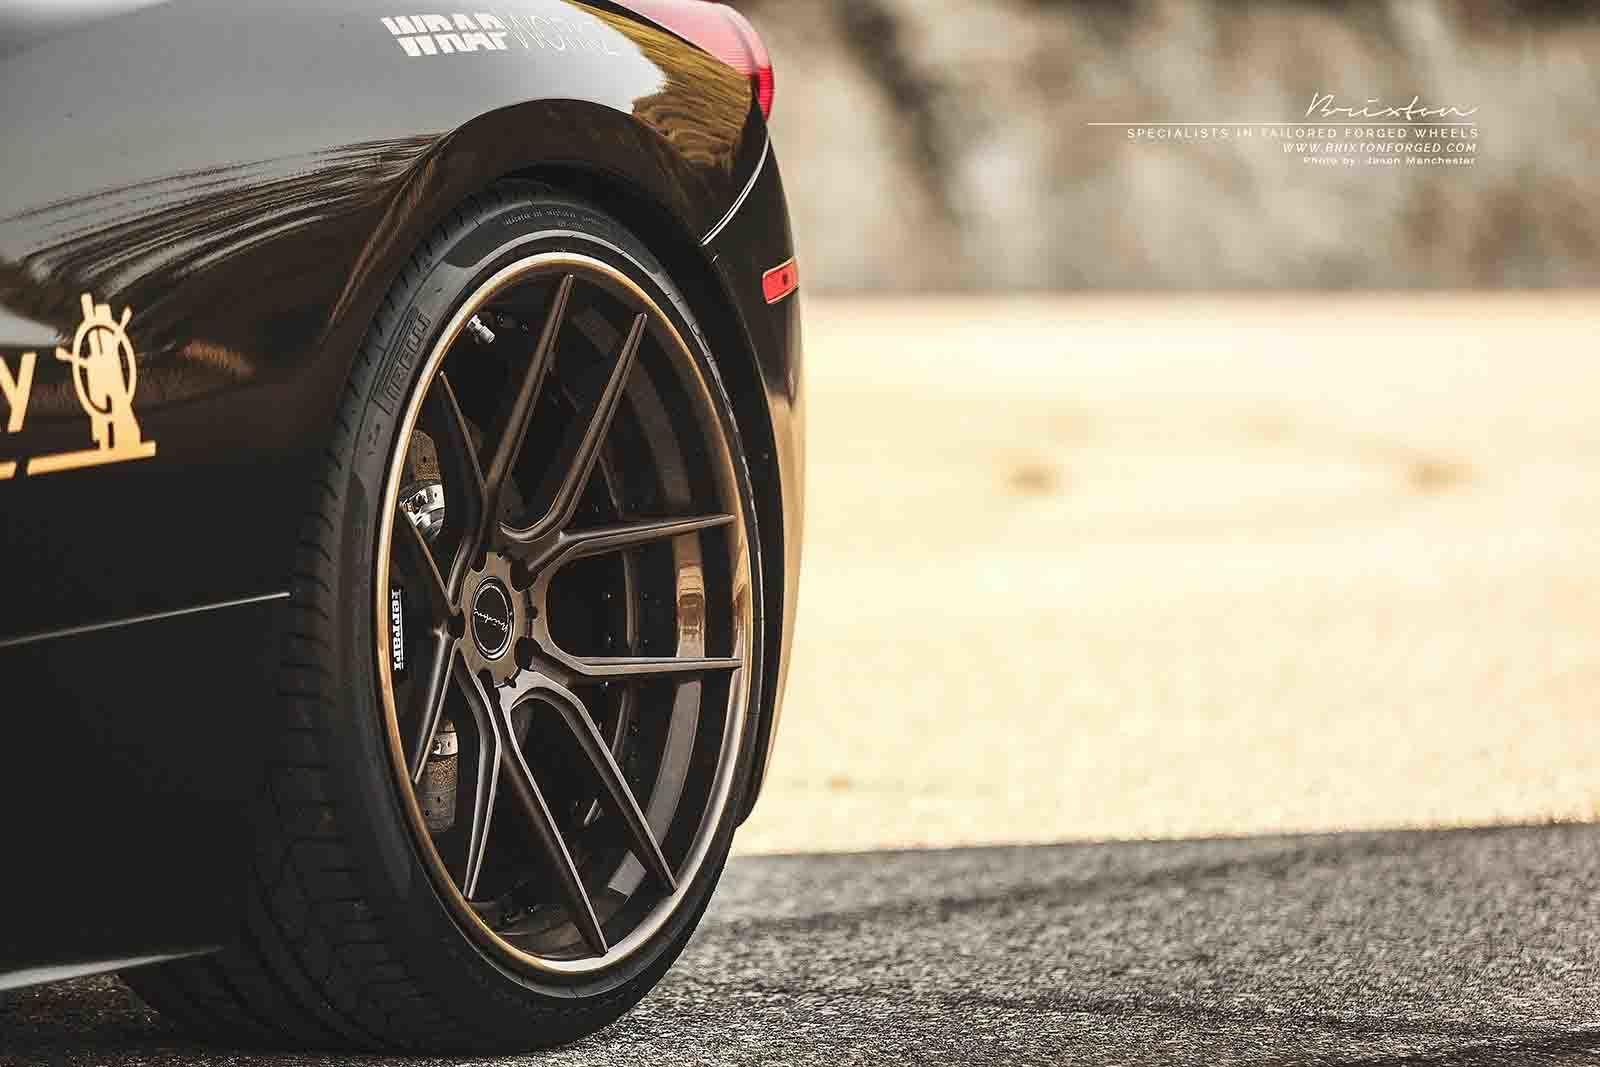 Brixton CM5 (Targa Series)